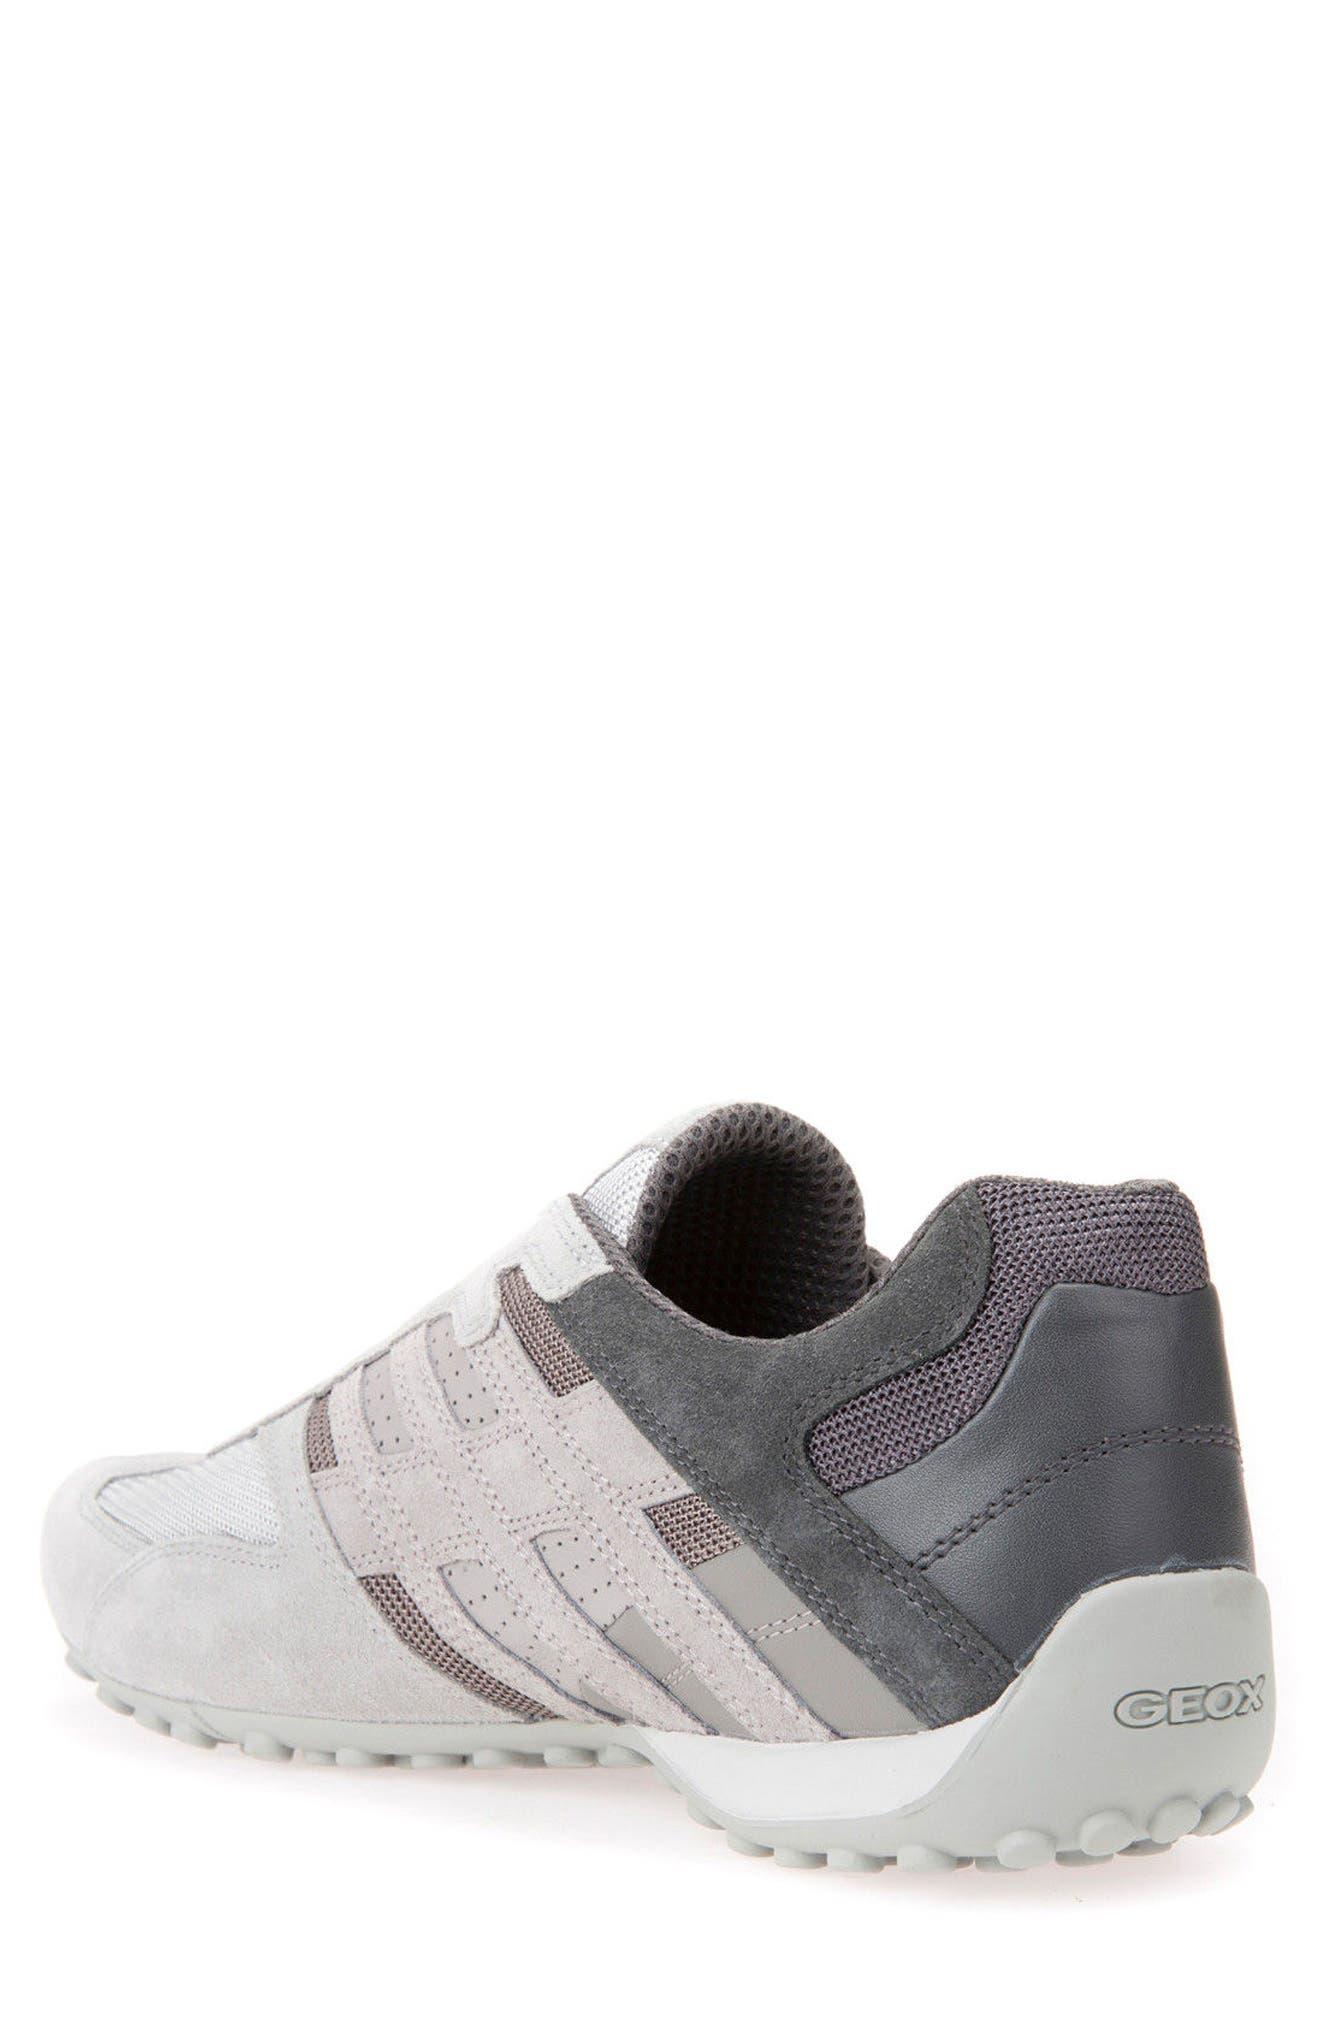 Snake 126 Laceless Low Top Sneaker,                             Alternate thumbnail 2, color,                             050